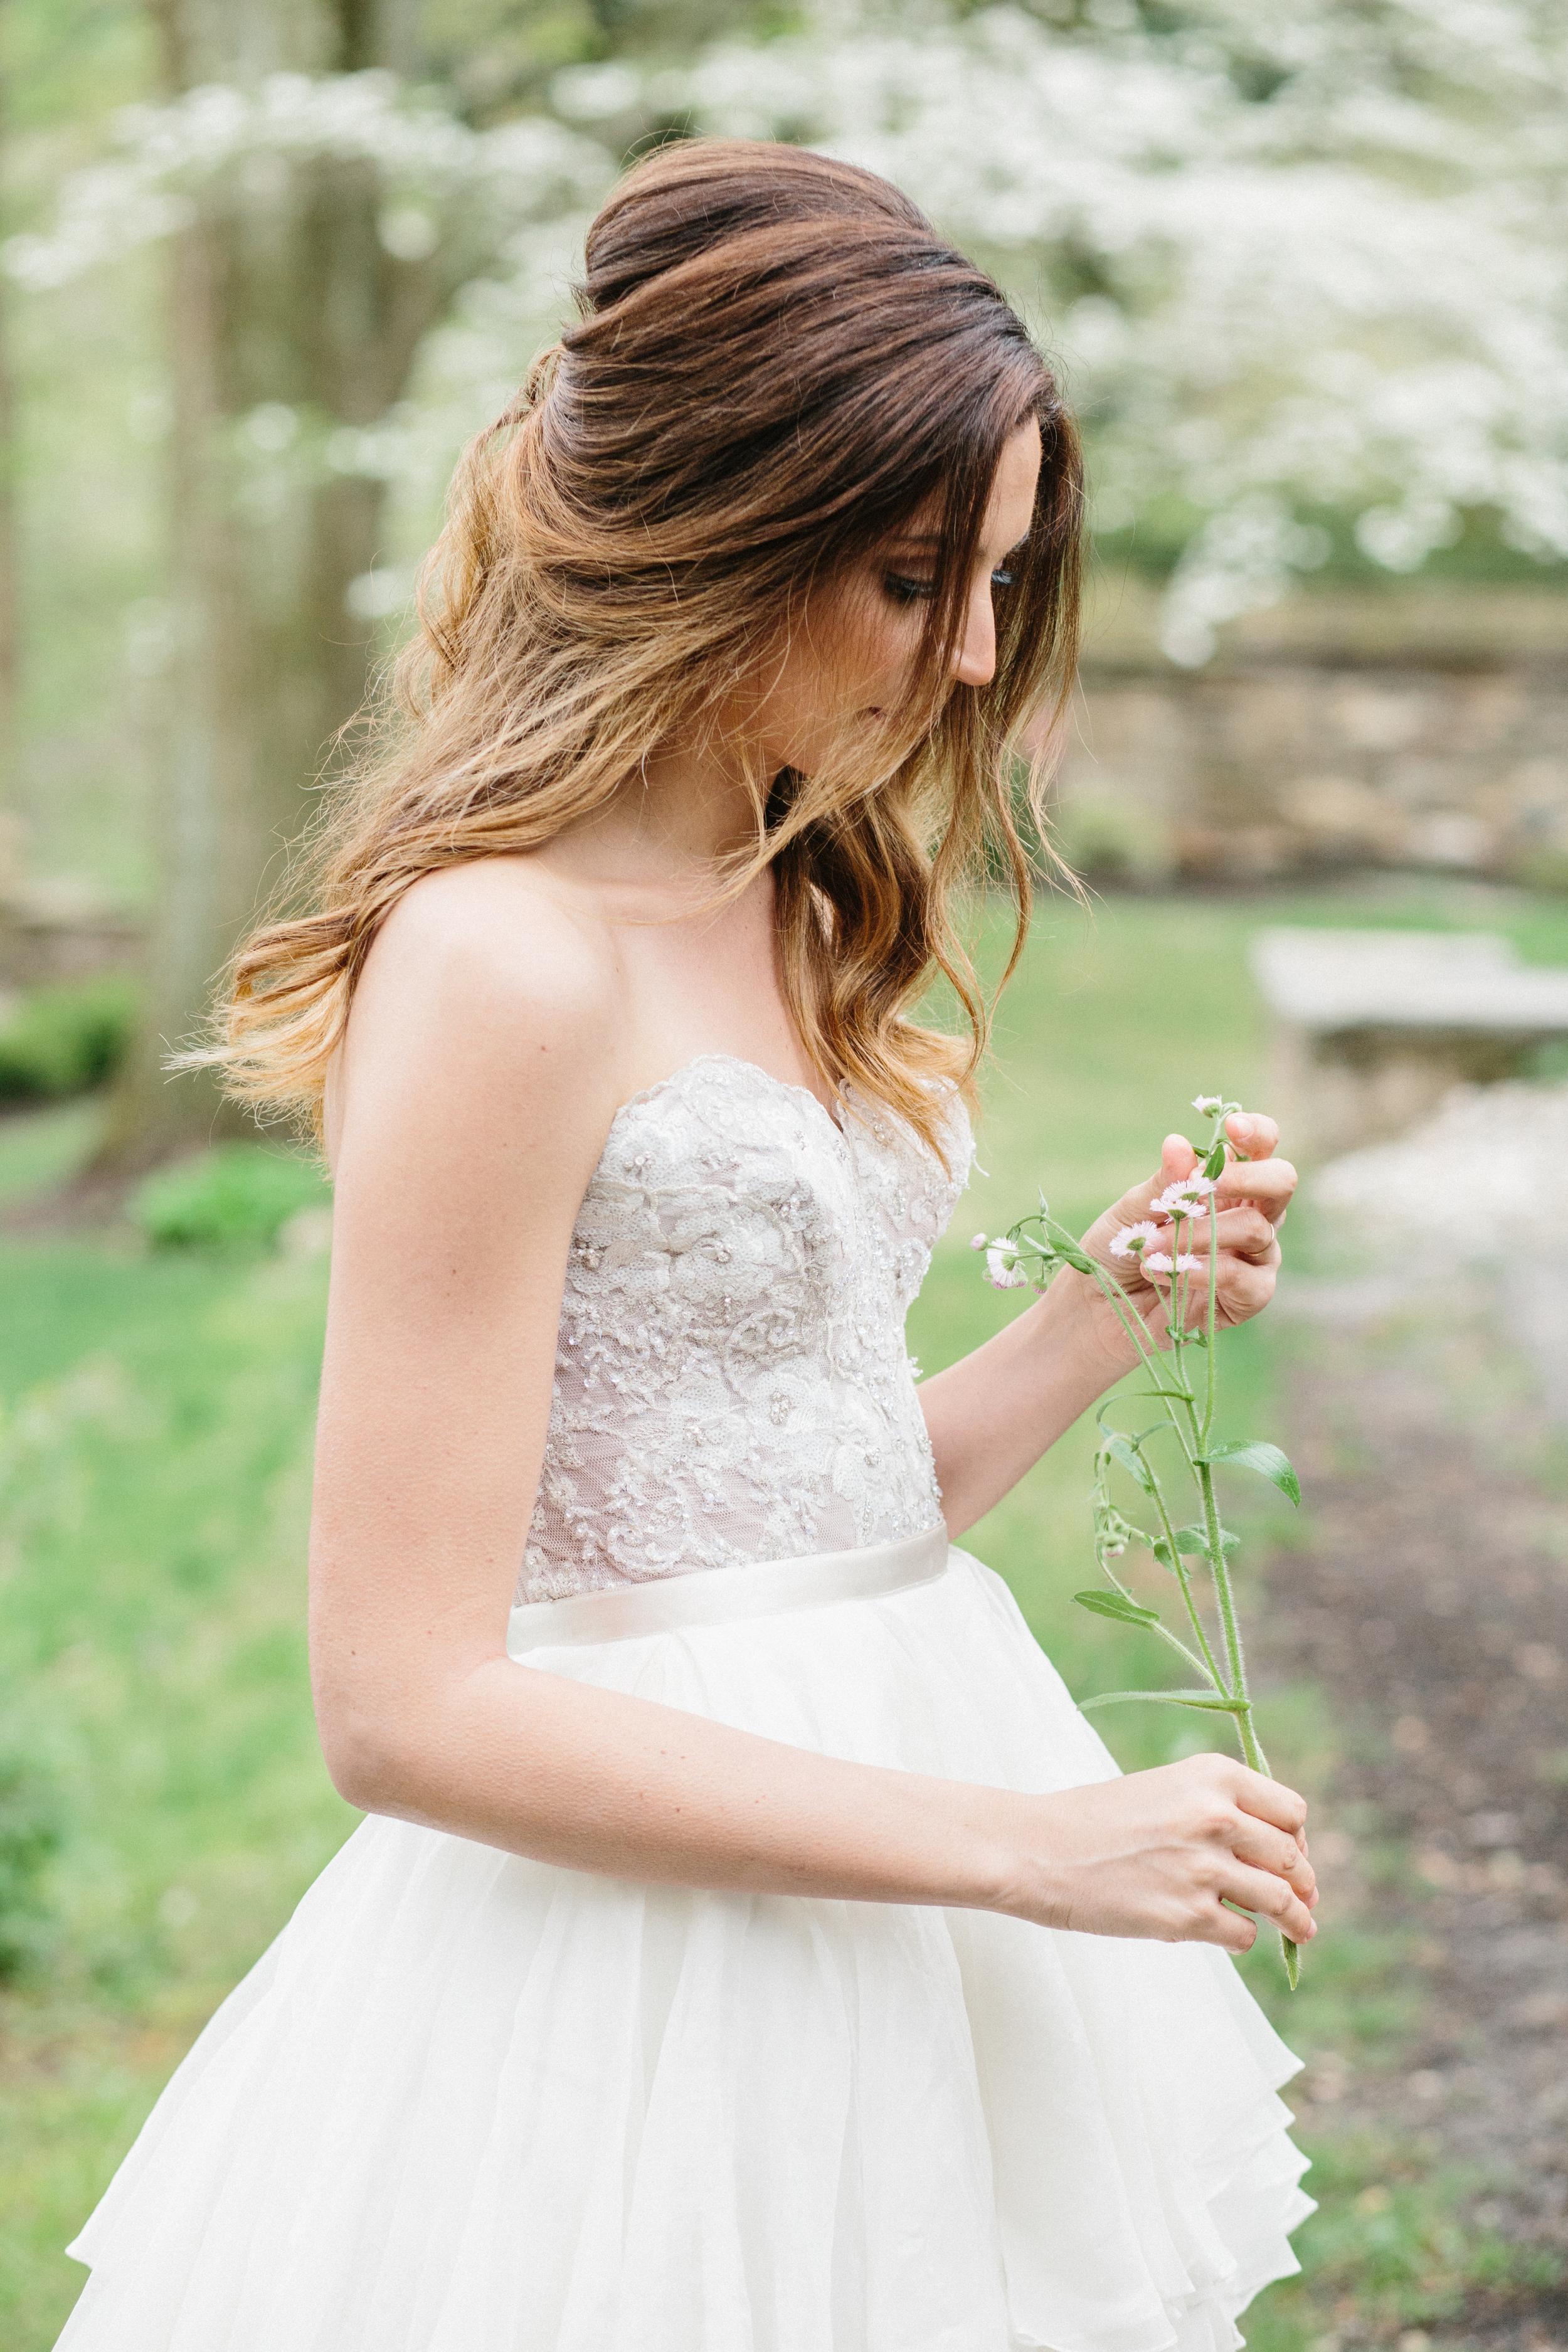 HNP-Modern-Fairytale-Spring-Wedding-Styled-Shoot_063.jpg